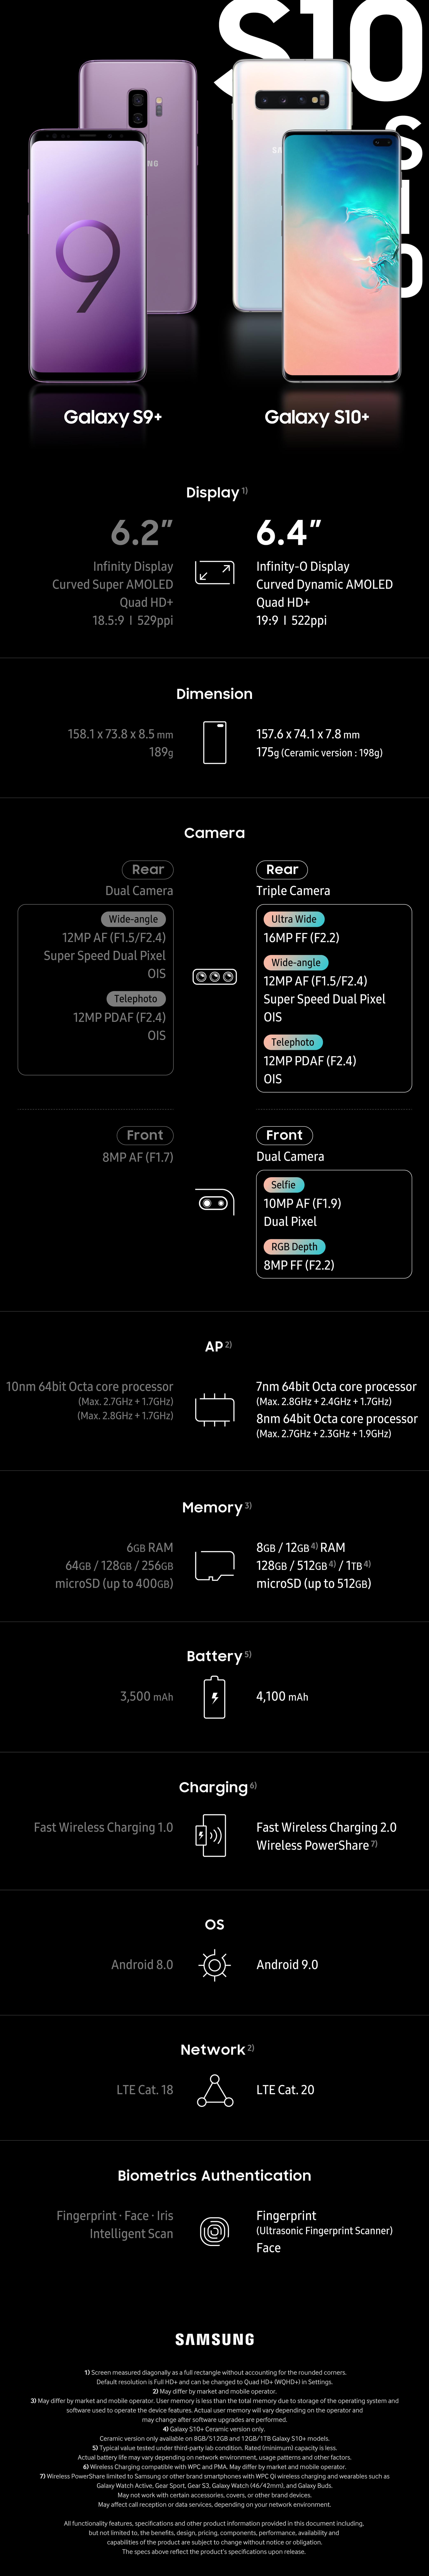 Сравнение Samsung Galaxy S10 + и Galaxy S9 +